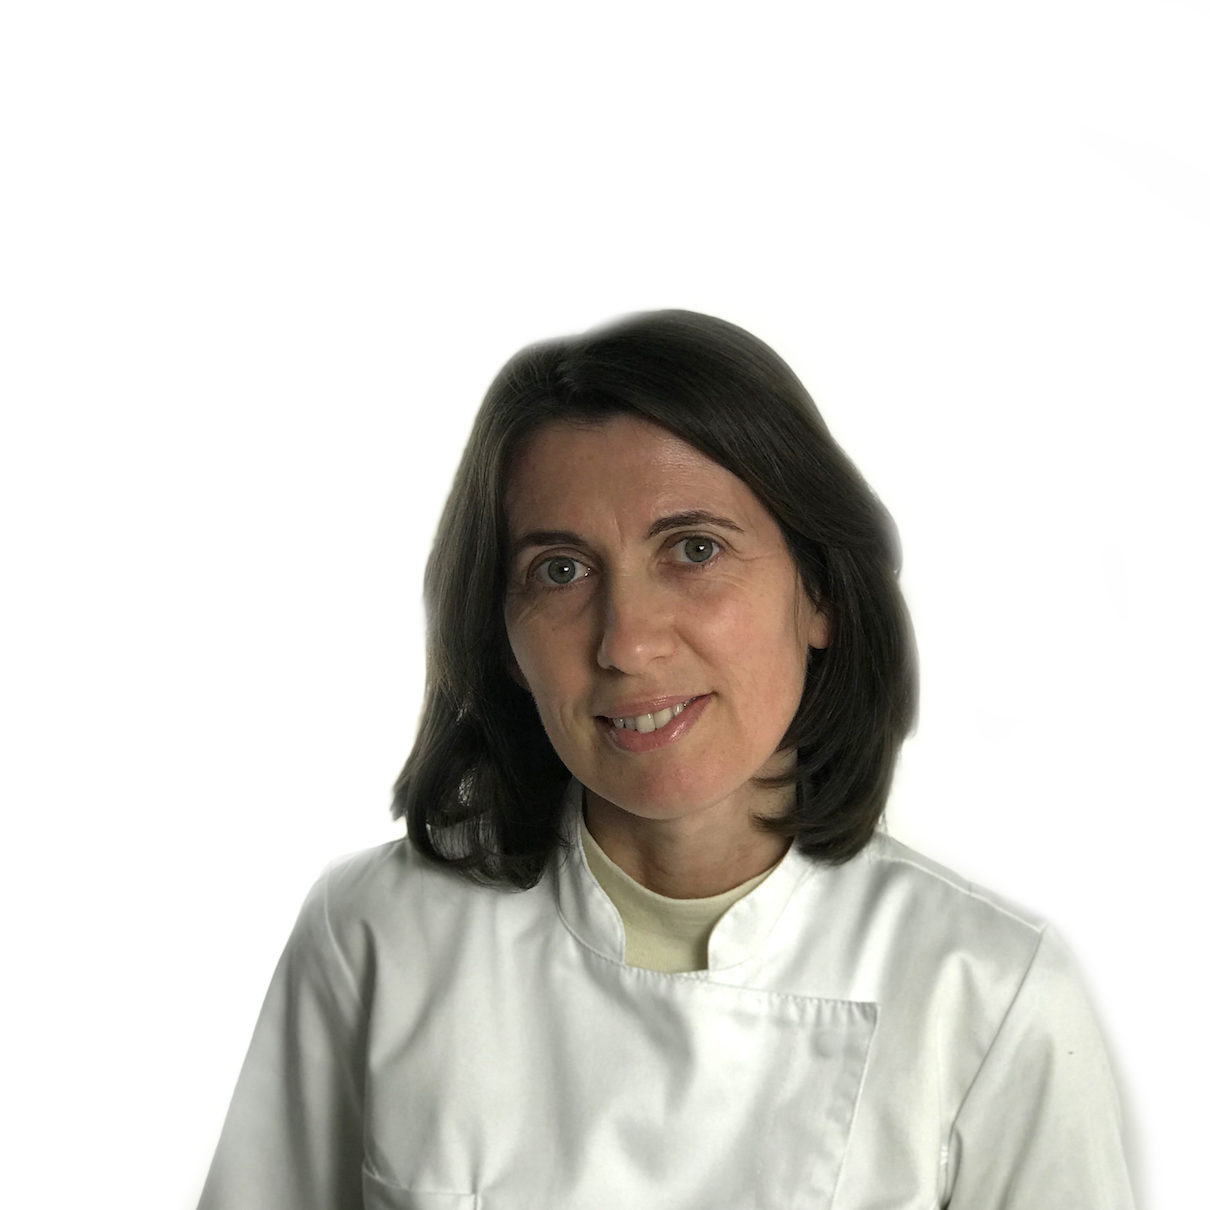 Nadine Fiorini